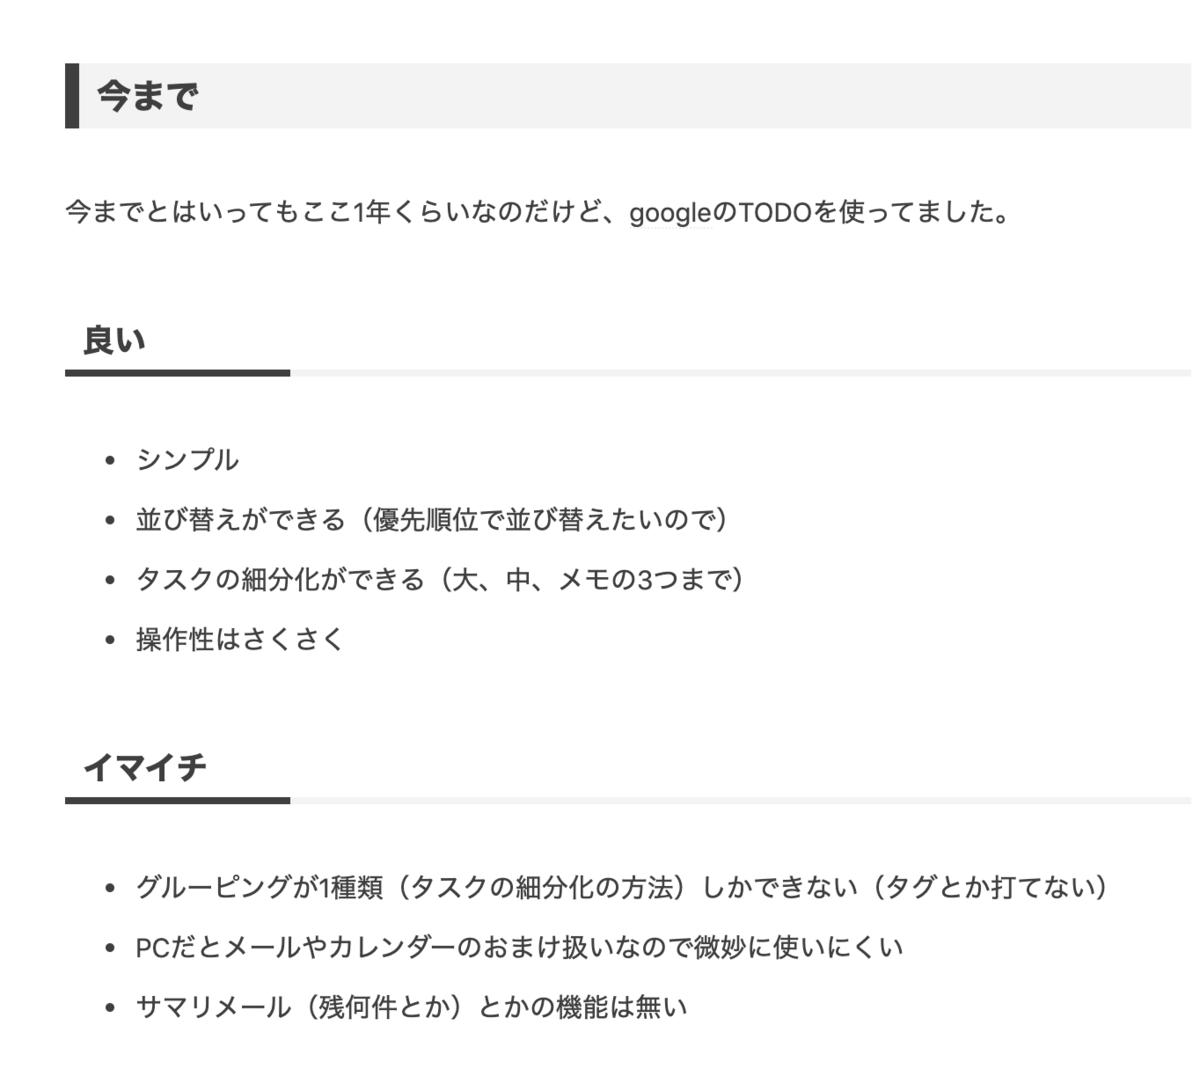 f:id:moyashidaisuke:20190909194901p:plain